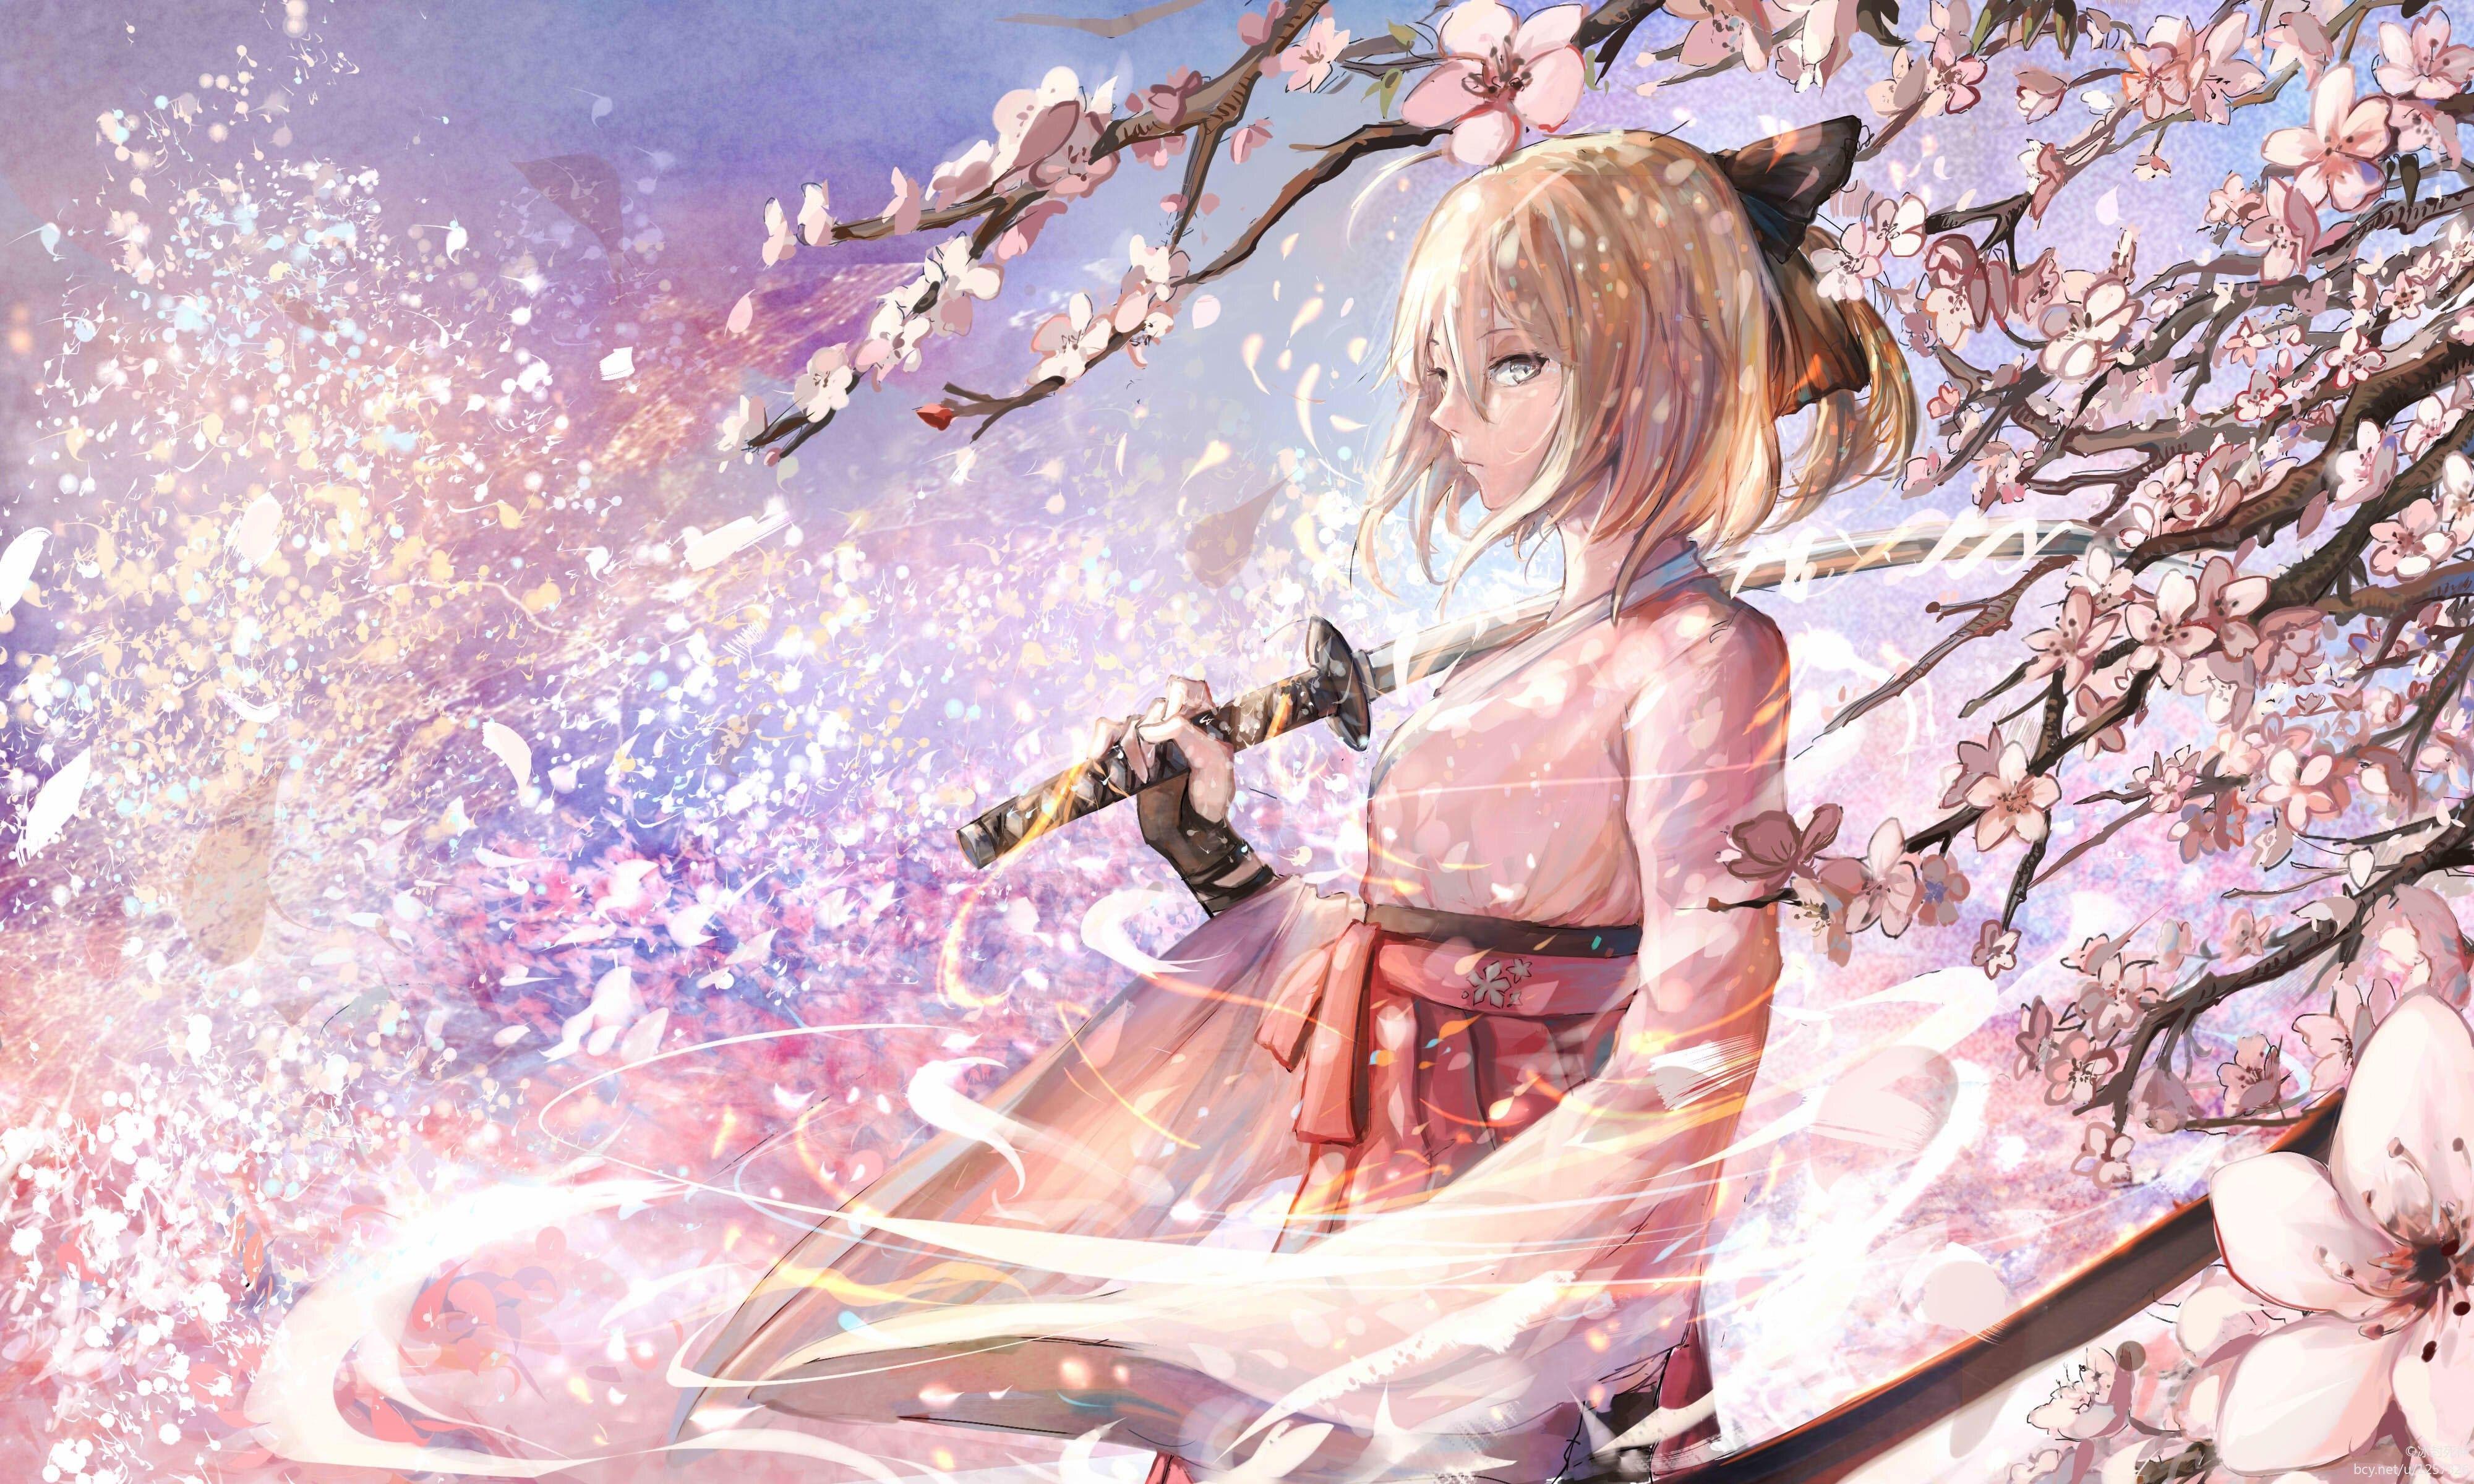 Anime Cherry Blossom Wallpaper Cherry Blossom Japanese Anime 1918369 Hd Wallpaper Backgrounds Download